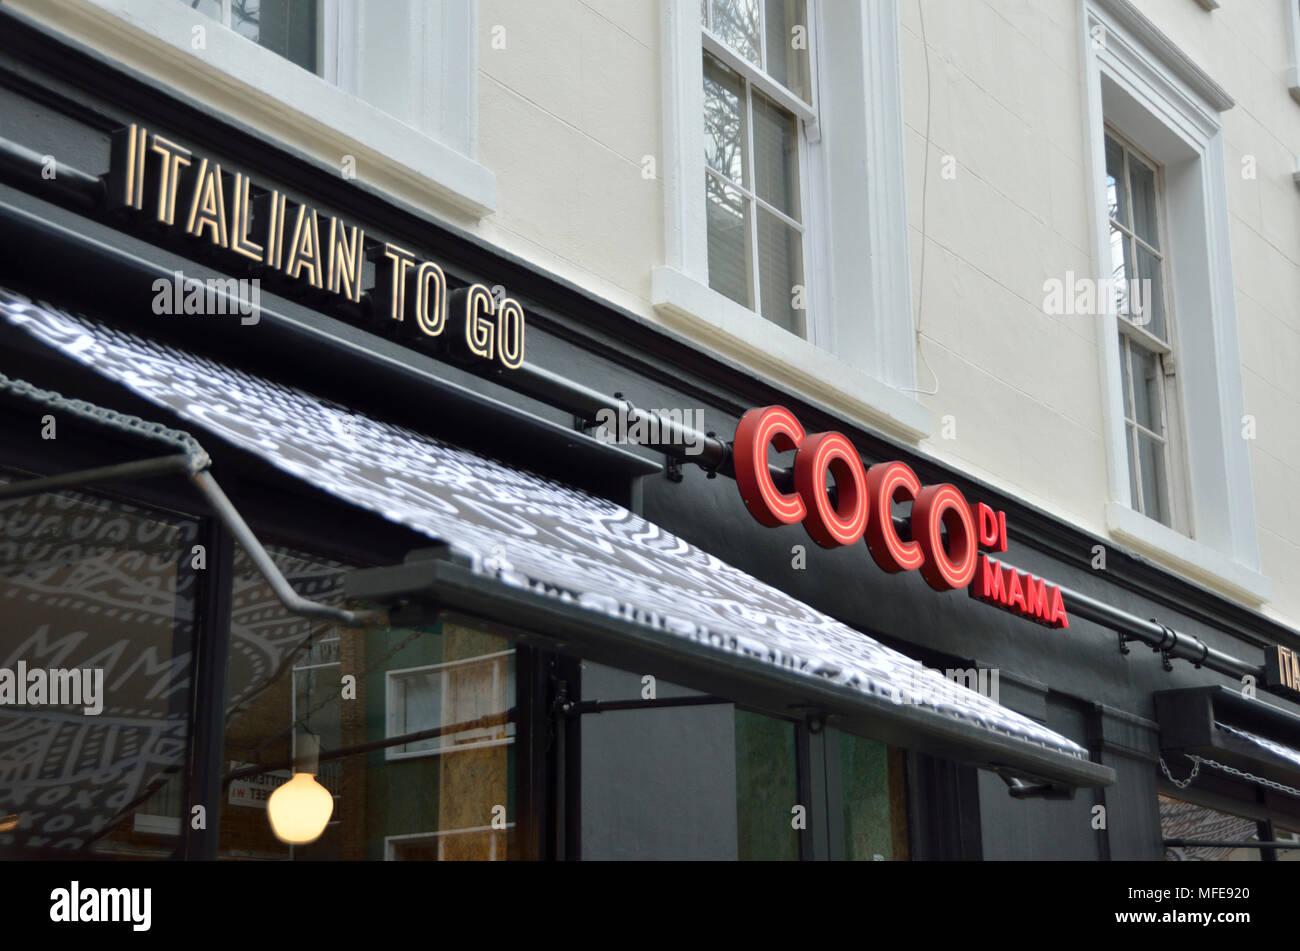 Coco di Mama takeaway in Tottenham Street, Fitzrovia, London, UK. - Stock Image